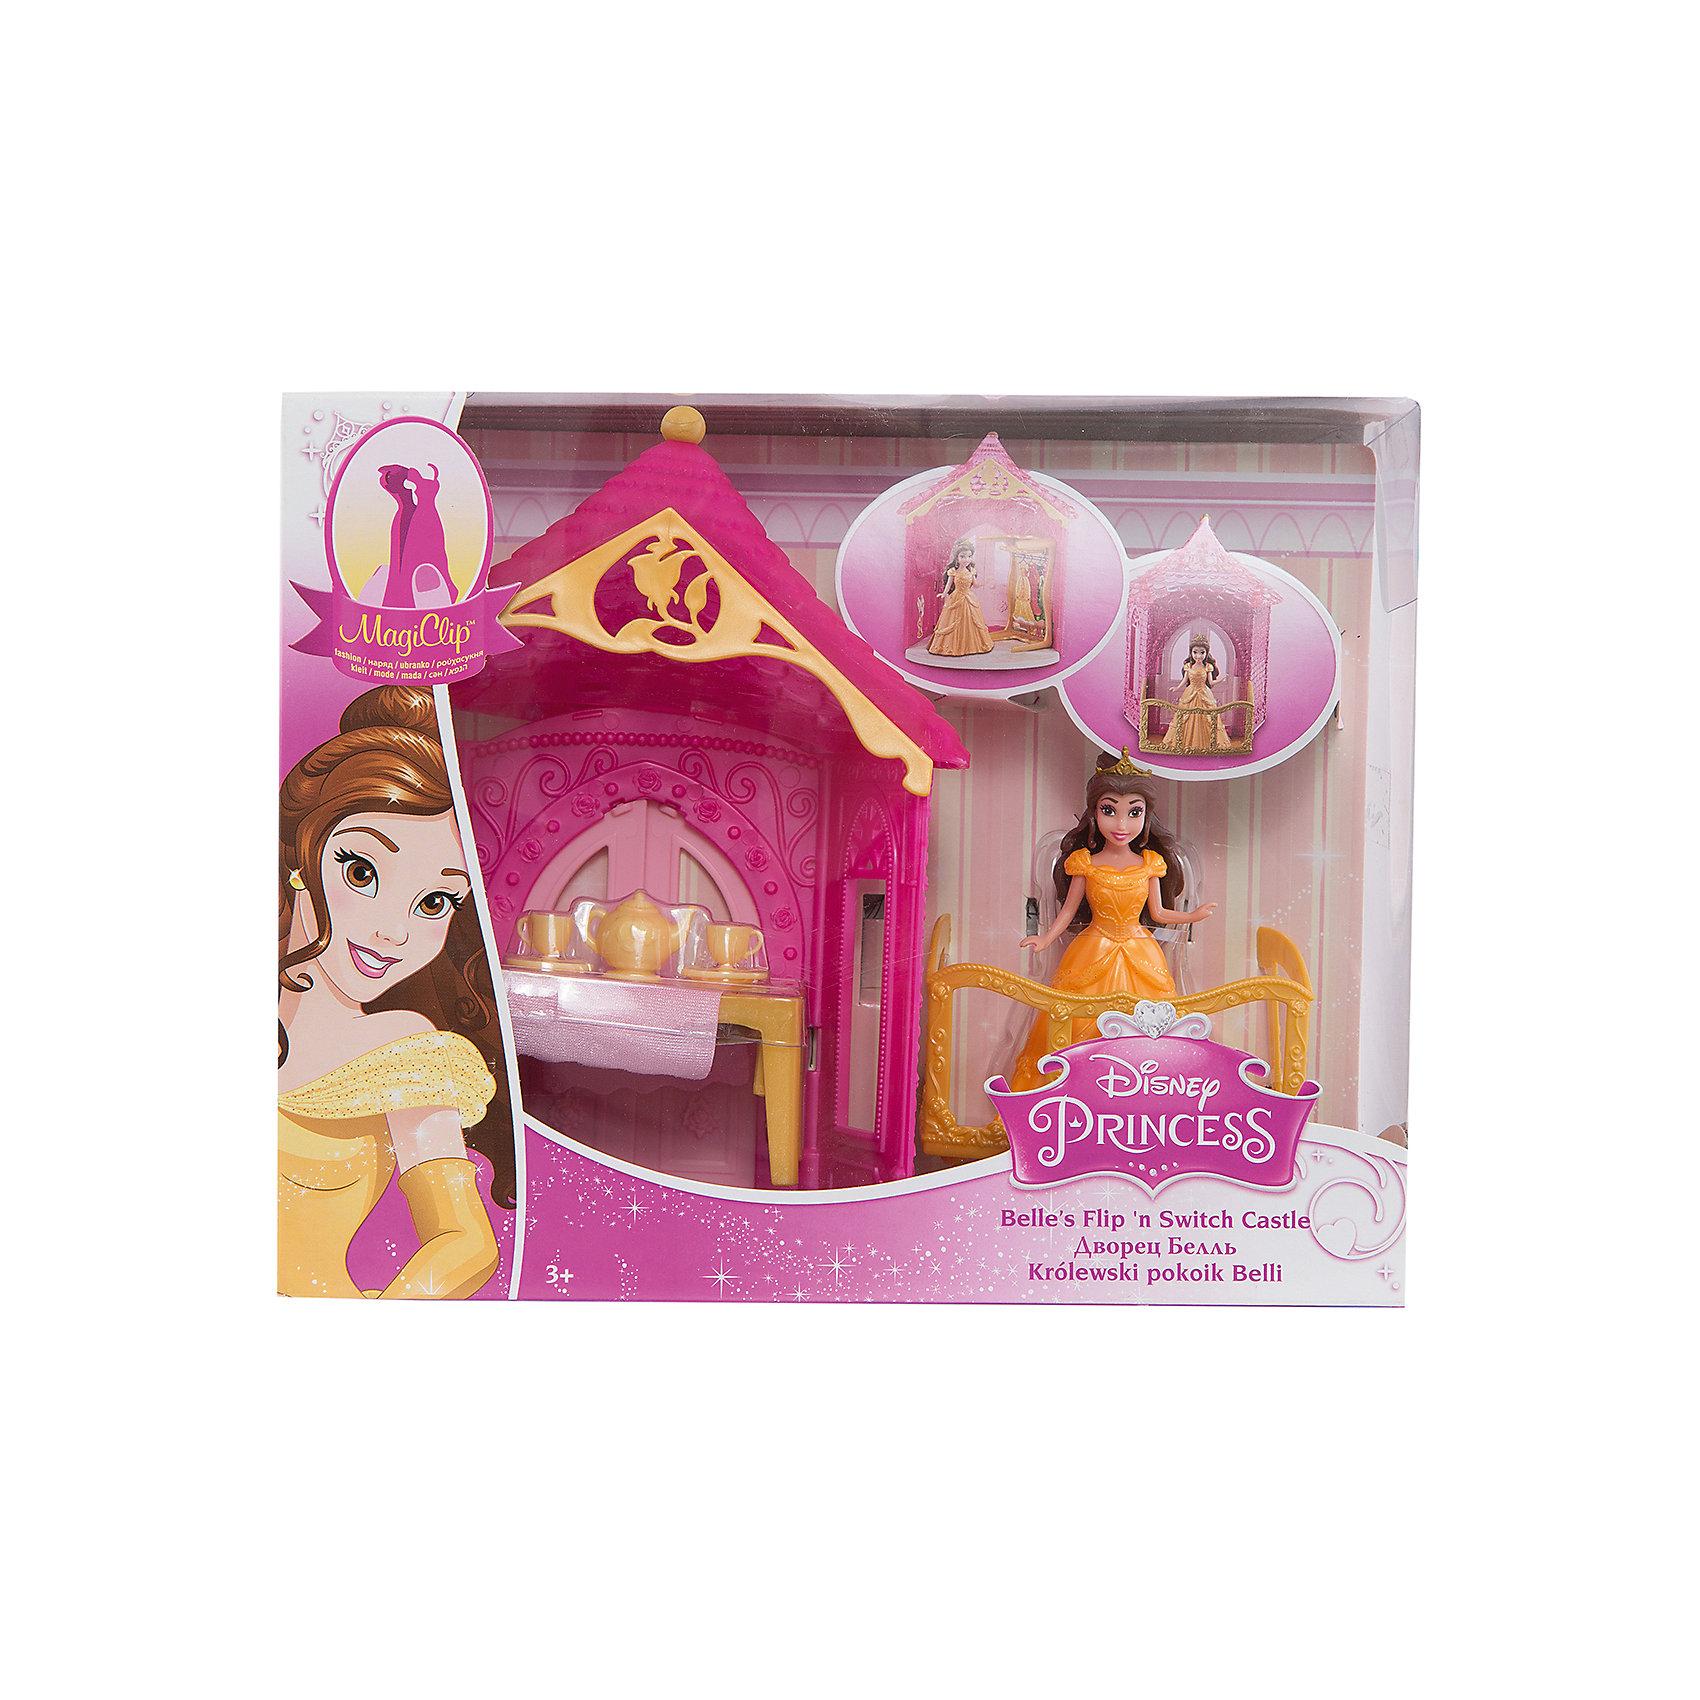 Набор Комната принцессы Бэлль, с куклой и аксессуарами, Disney PrincessИгрушки<br><br><br>Ширина мм: 205<br>Глубина мм: 80<br>Высота мм: 250<br>Вес г: 398<br>Возраст от месяцев: 36<br>Возраст до месяцев: 144<br>Пол: Женский<br>Возраст: Детский<br>SKU: 4739607